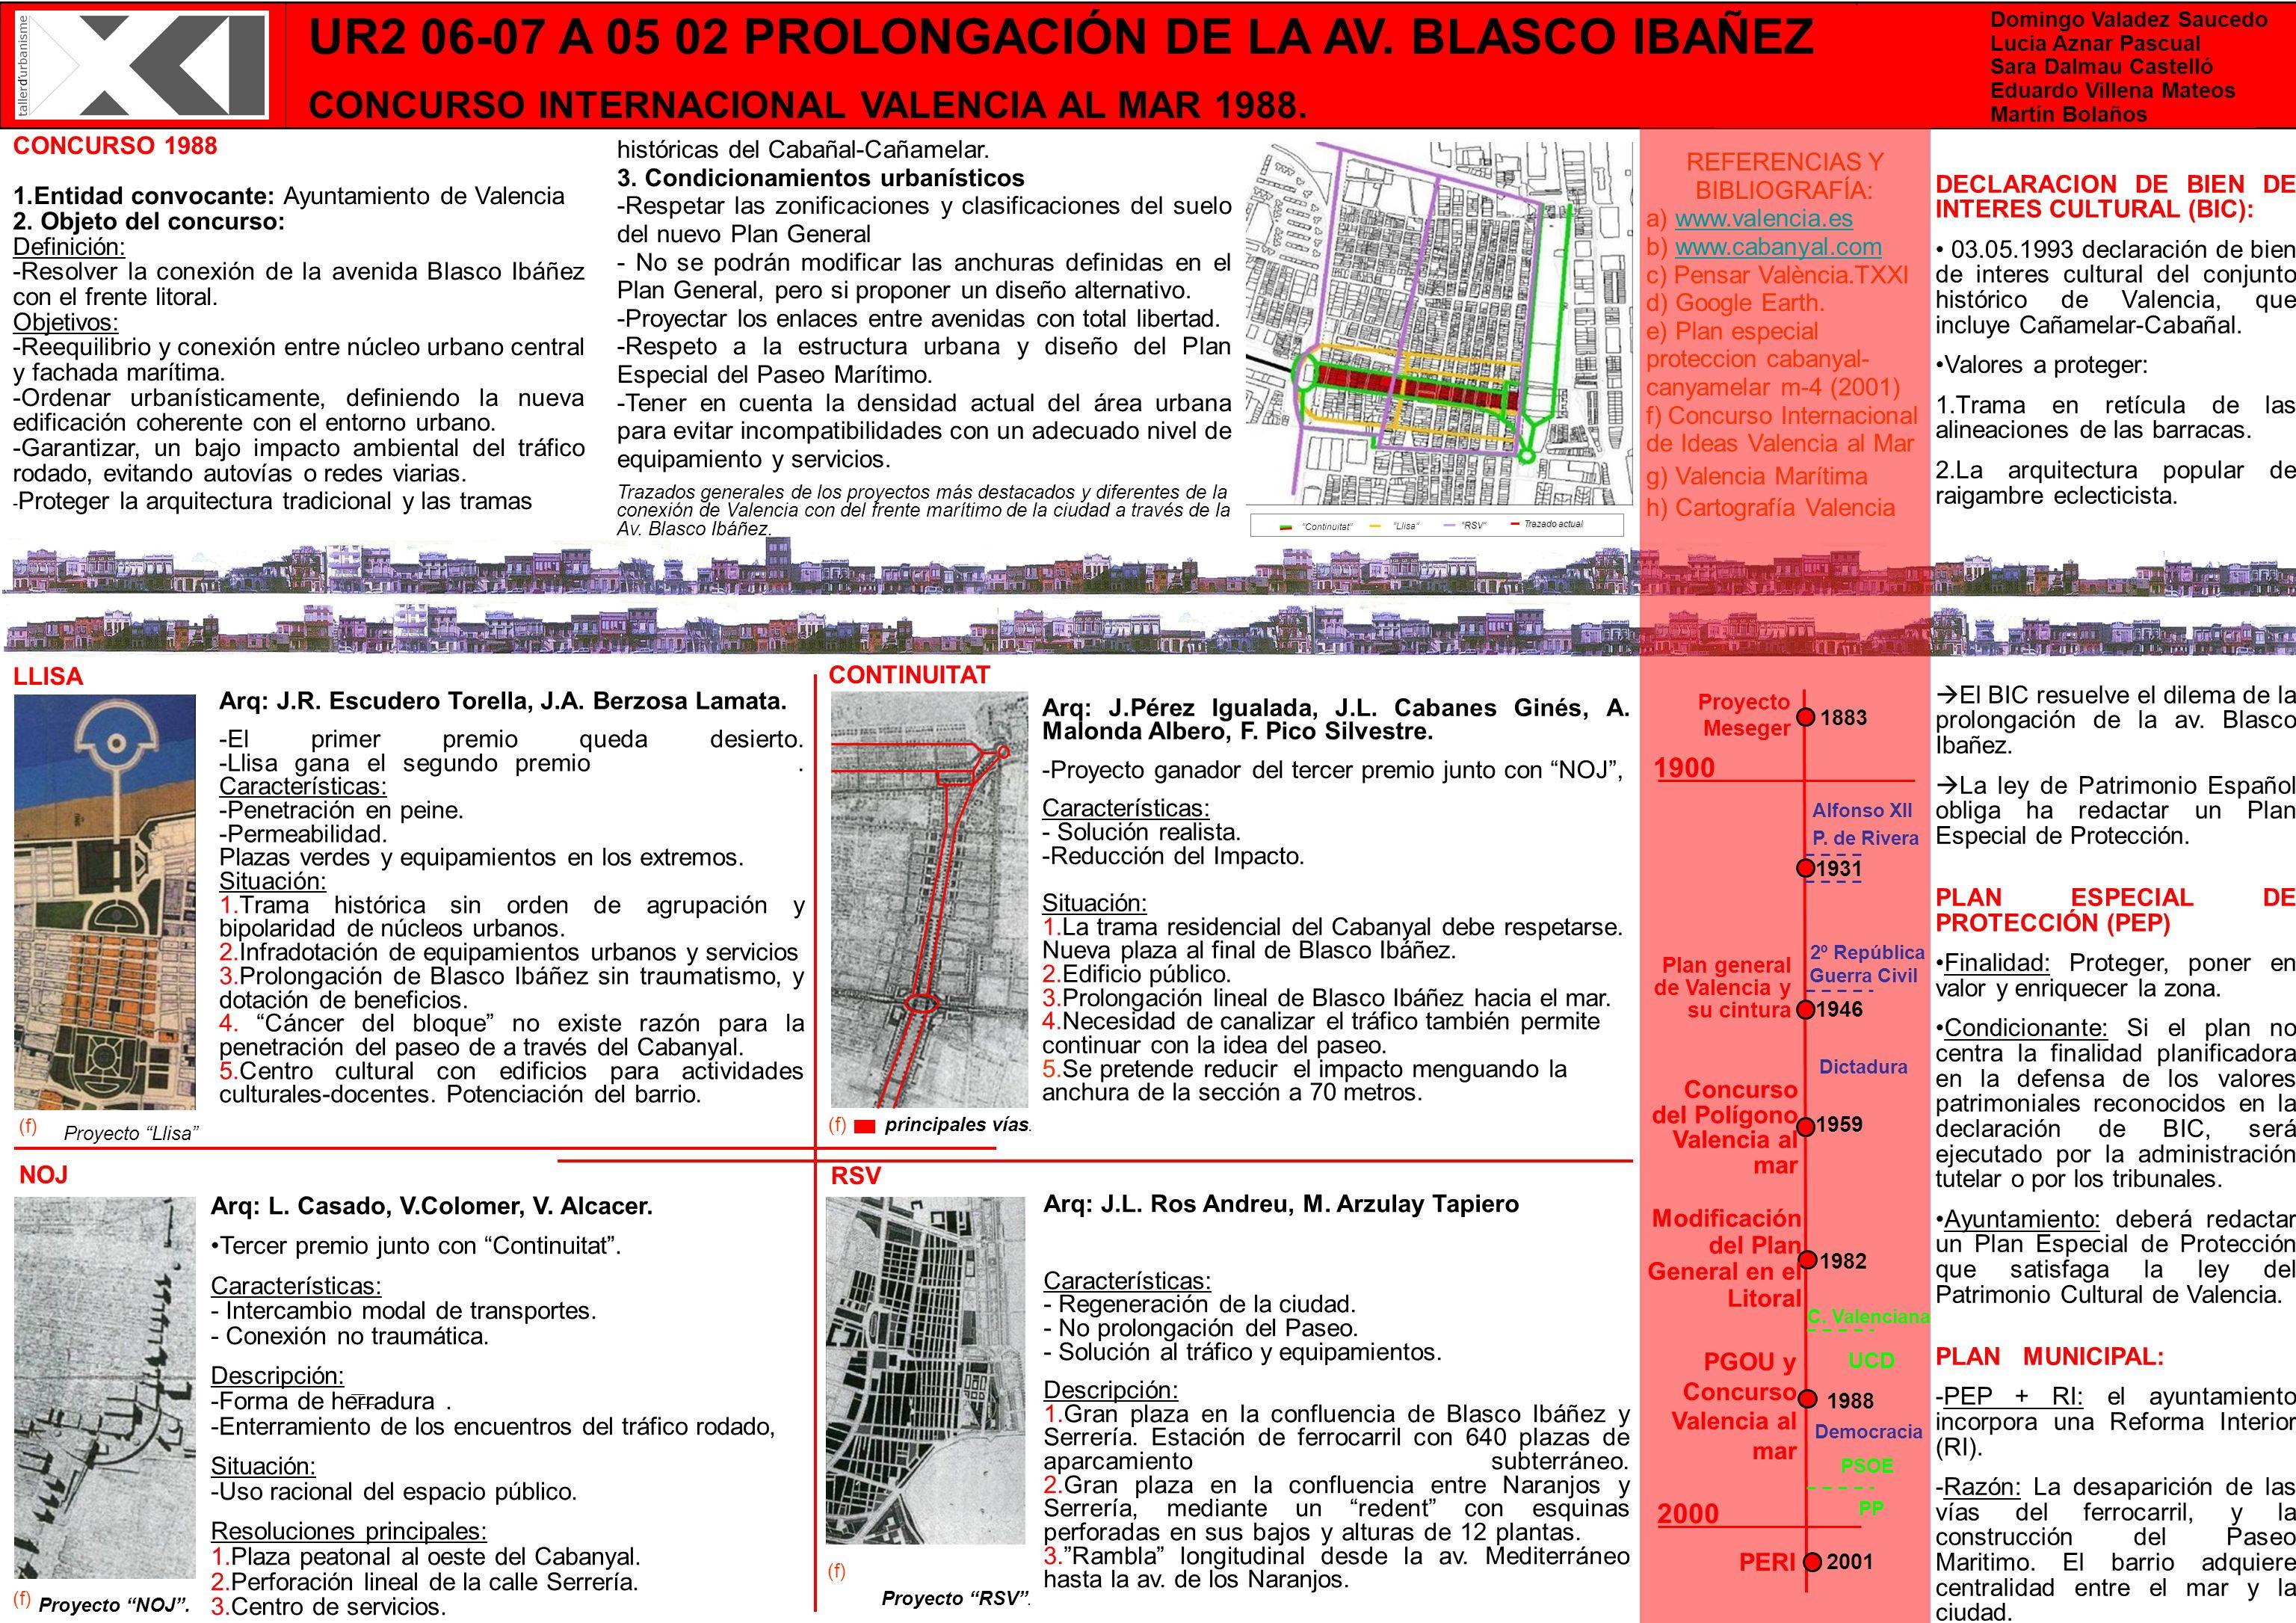 Título del Trabajo UR2 06-07 Fase A GG PP Título del Trabajo Apellido Apellido, Nombre Arq: J.Pérez Igualada, J.L. Cabanes Ginés, A. Malonda Albero, F